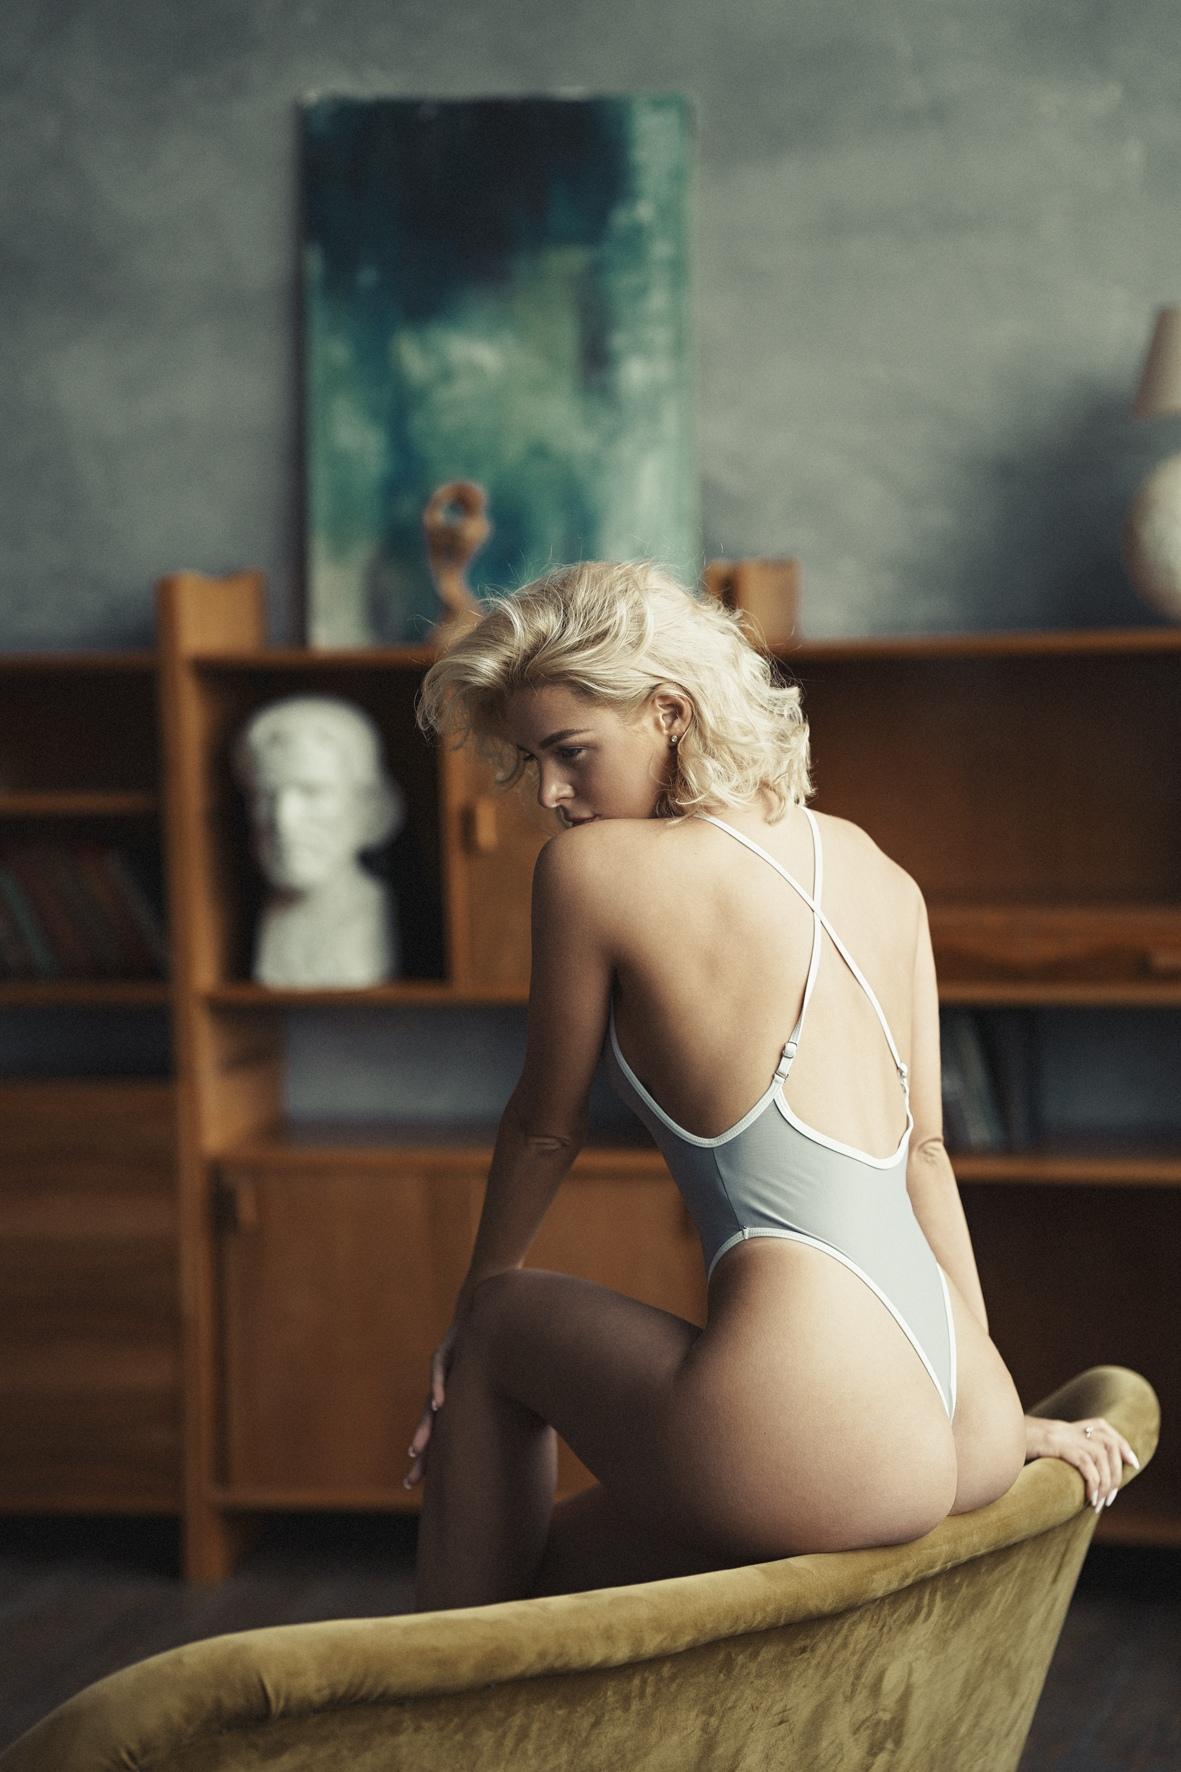 People 1181x1772 Vladimir Serkov women Alexandra Romanovna blonde short hair wavy hair bodysuit ass couch indoors